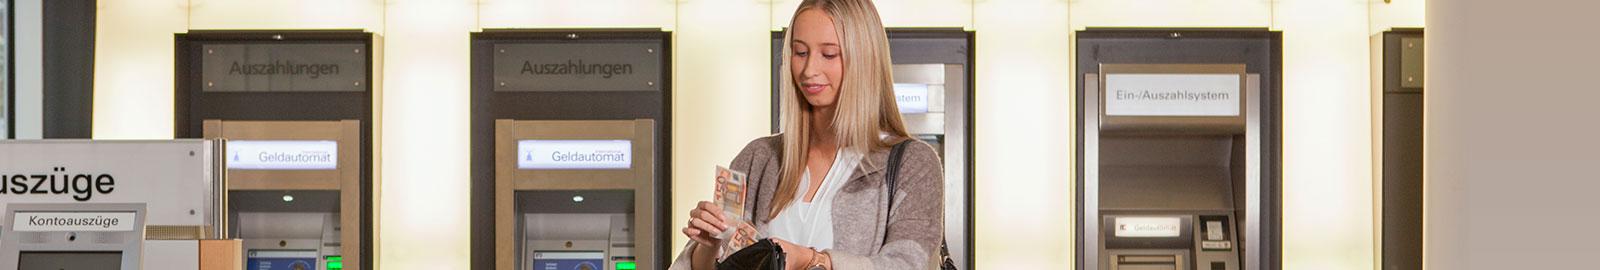 Geldautomaten G Volksbank Raiffeisenbank